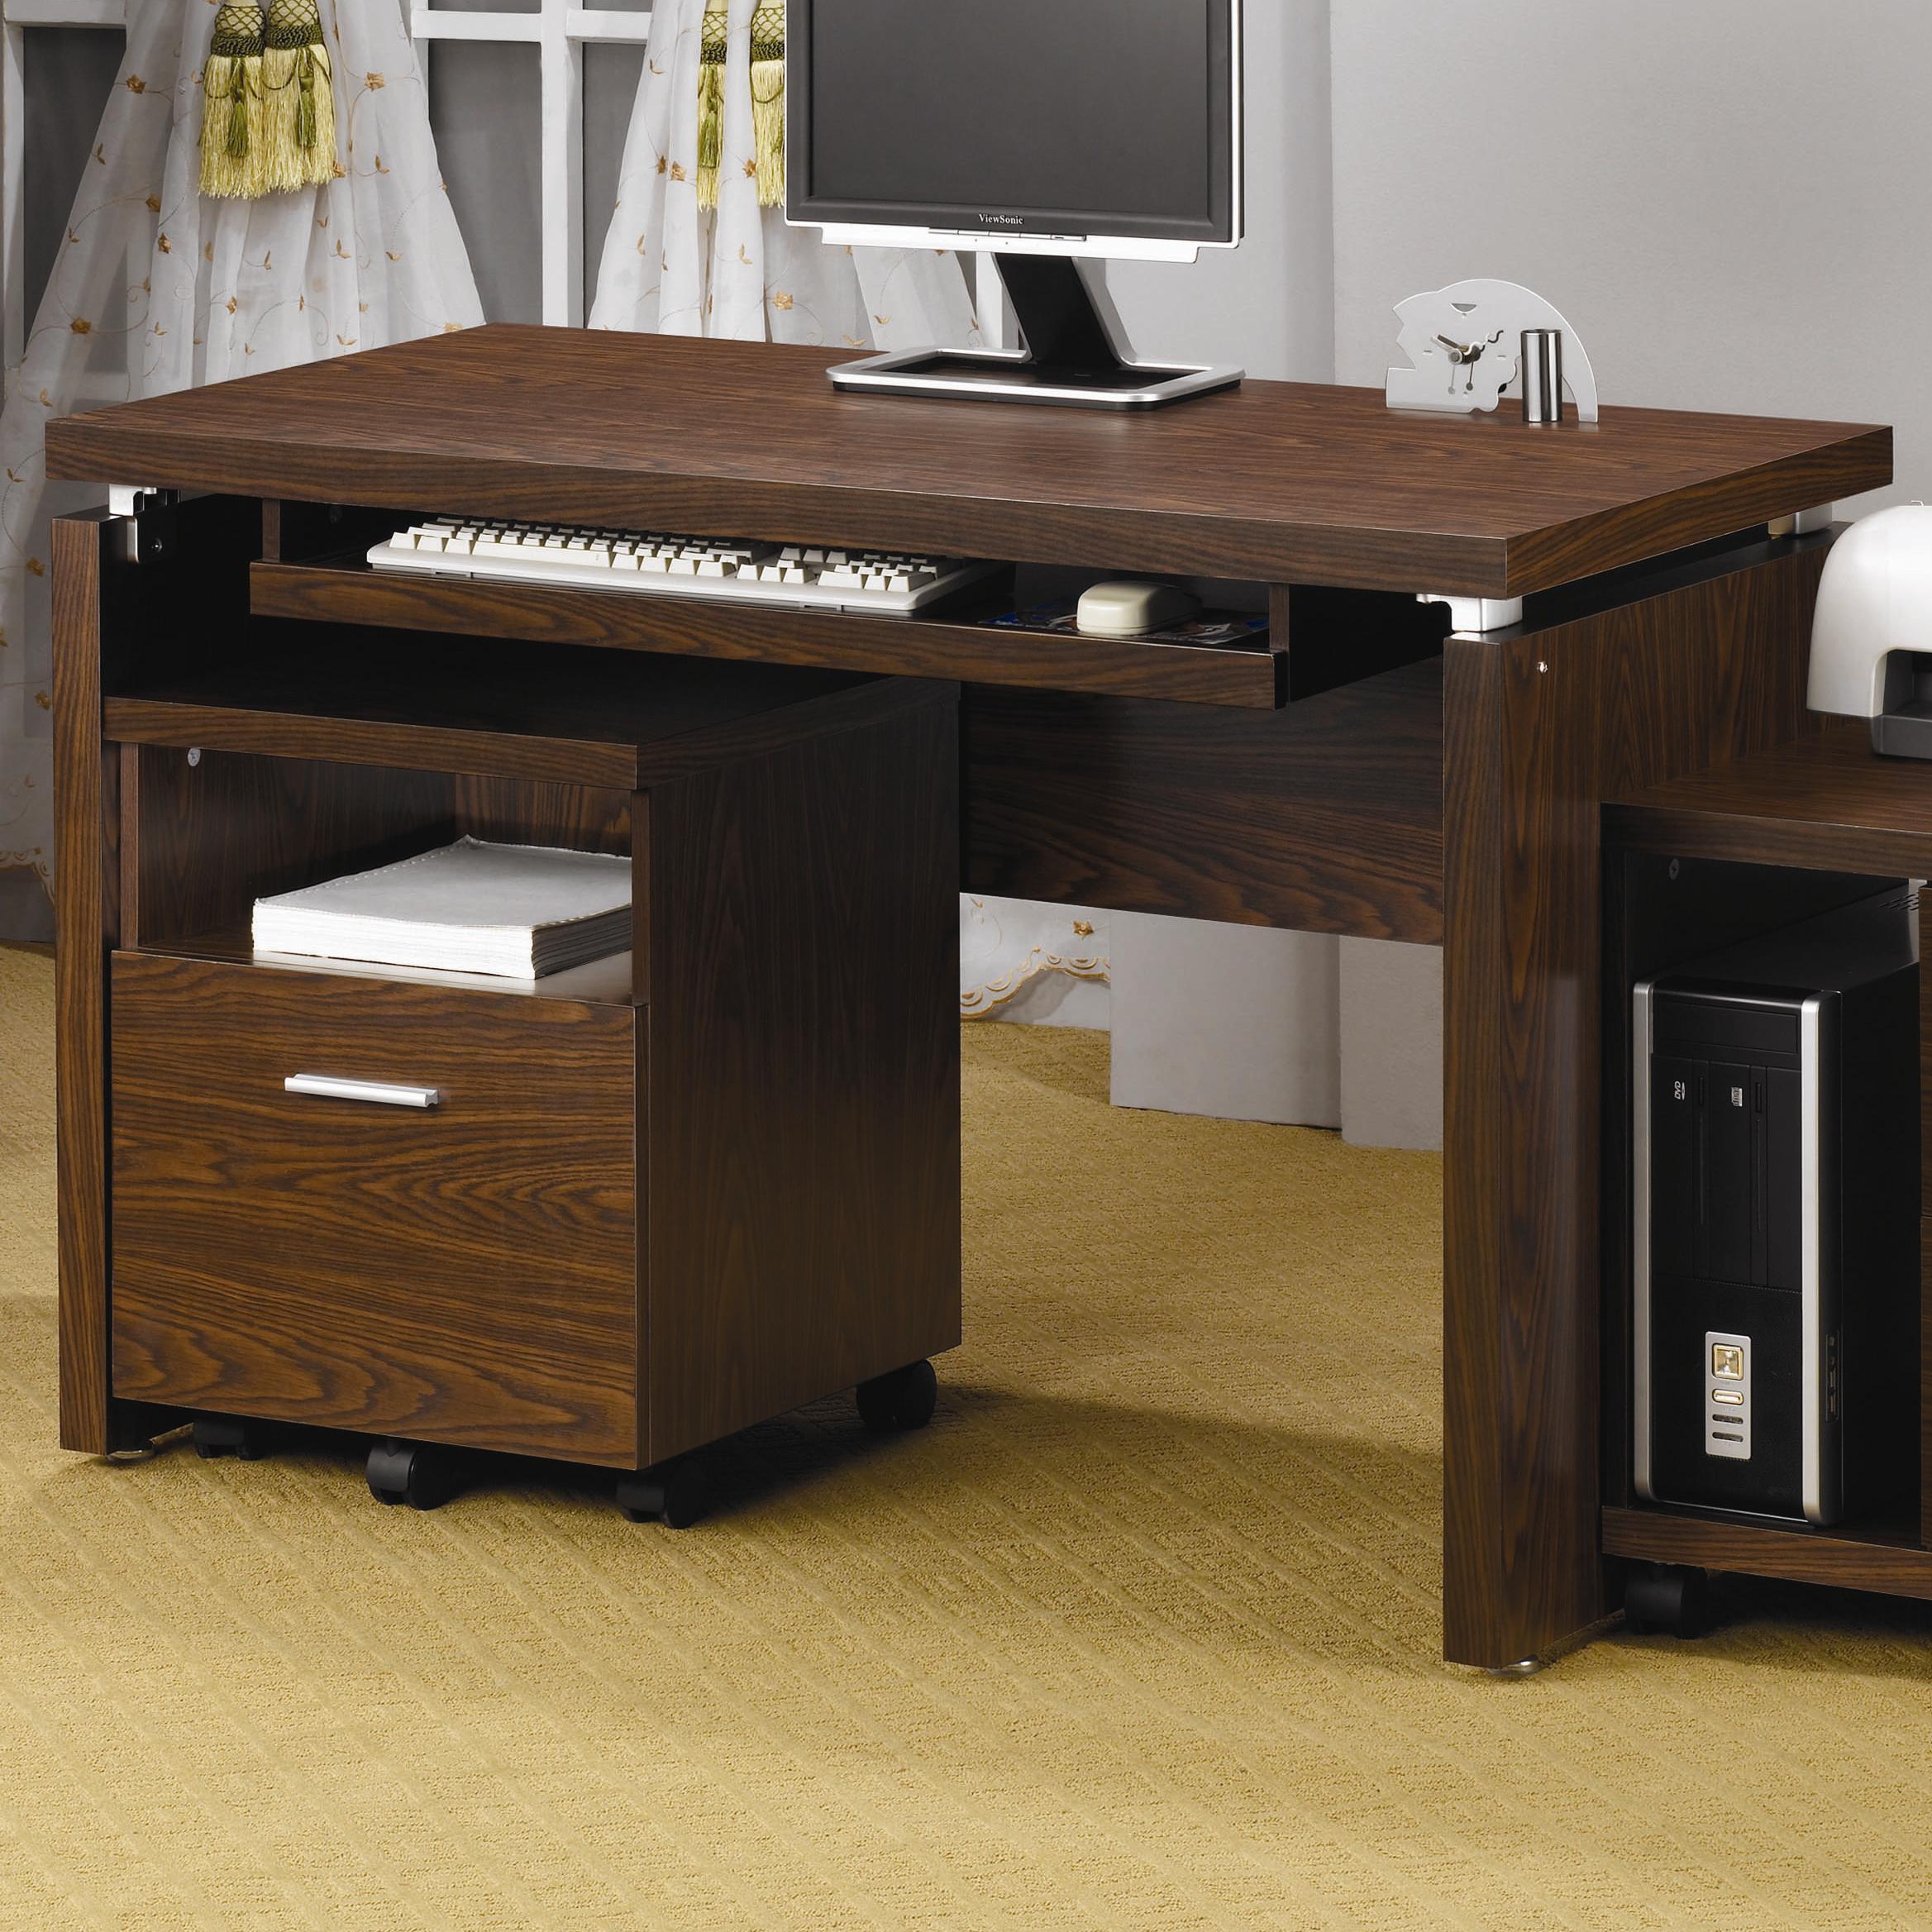 Coaster Peel Computer Desk - Item Number: 800831